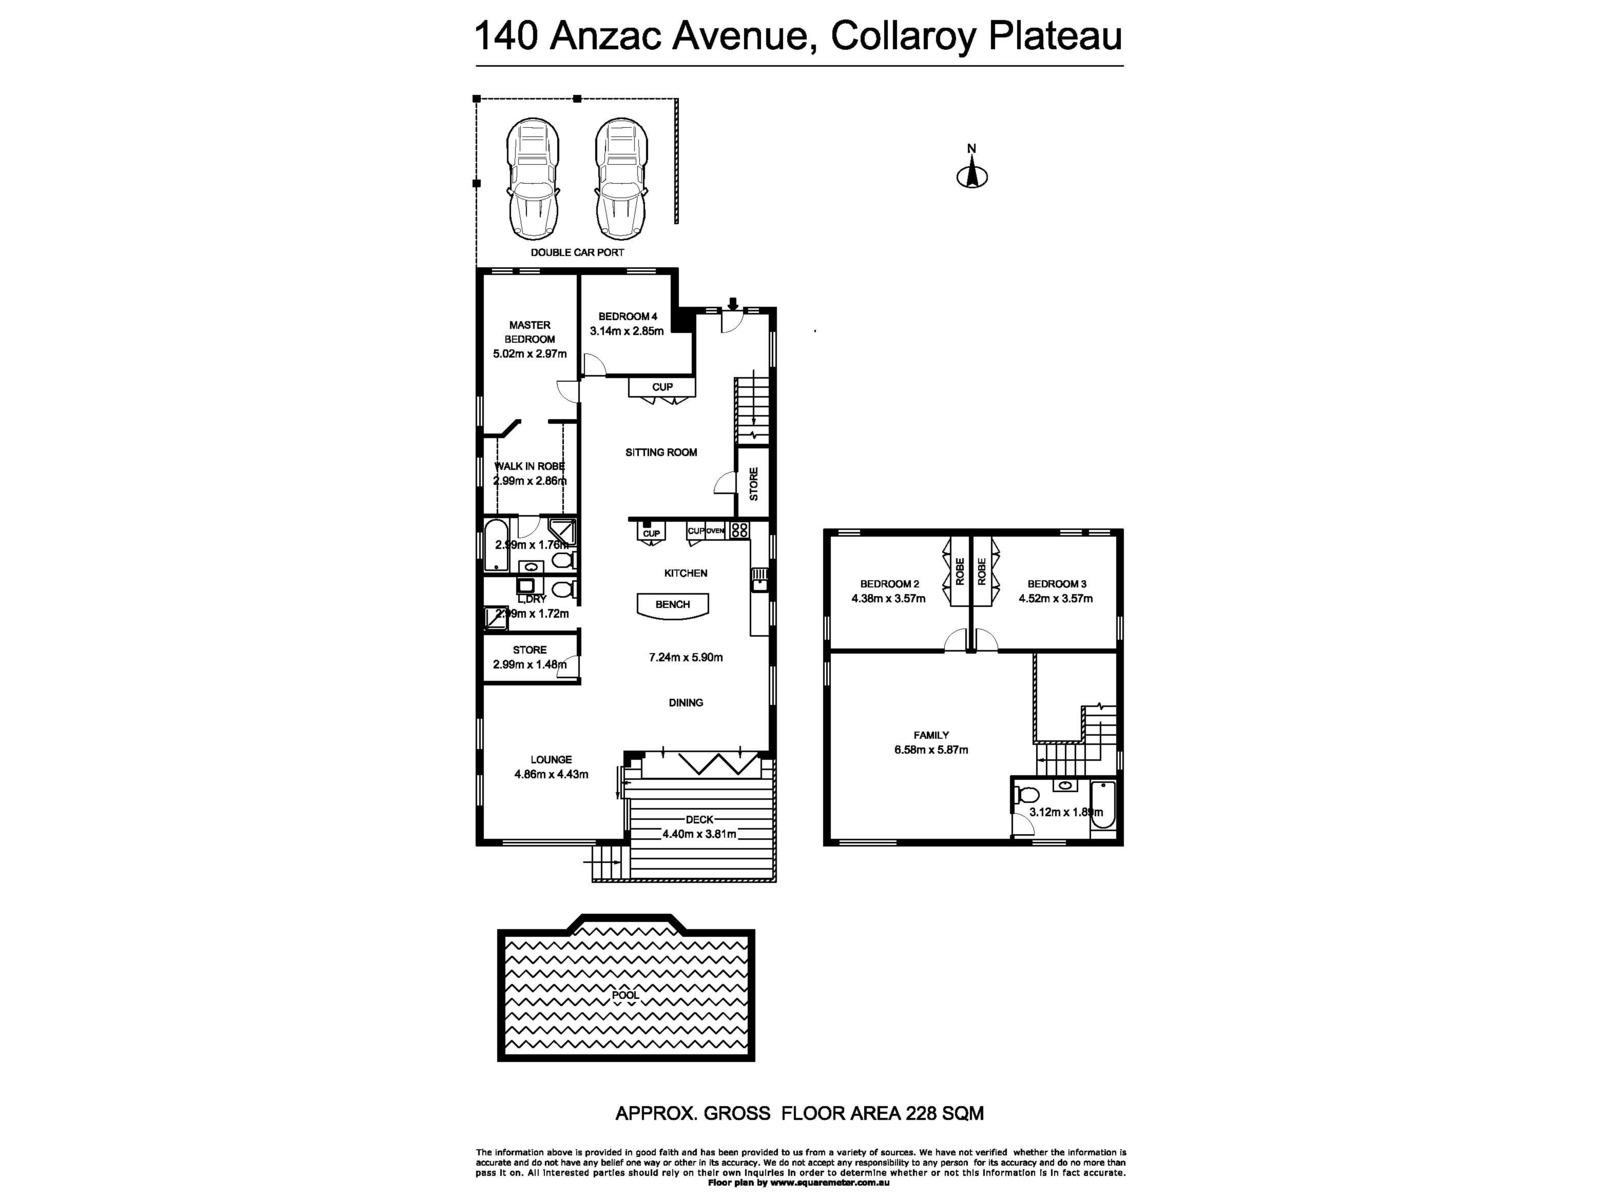 140 Anzac Avenue, Collaroy Plateau